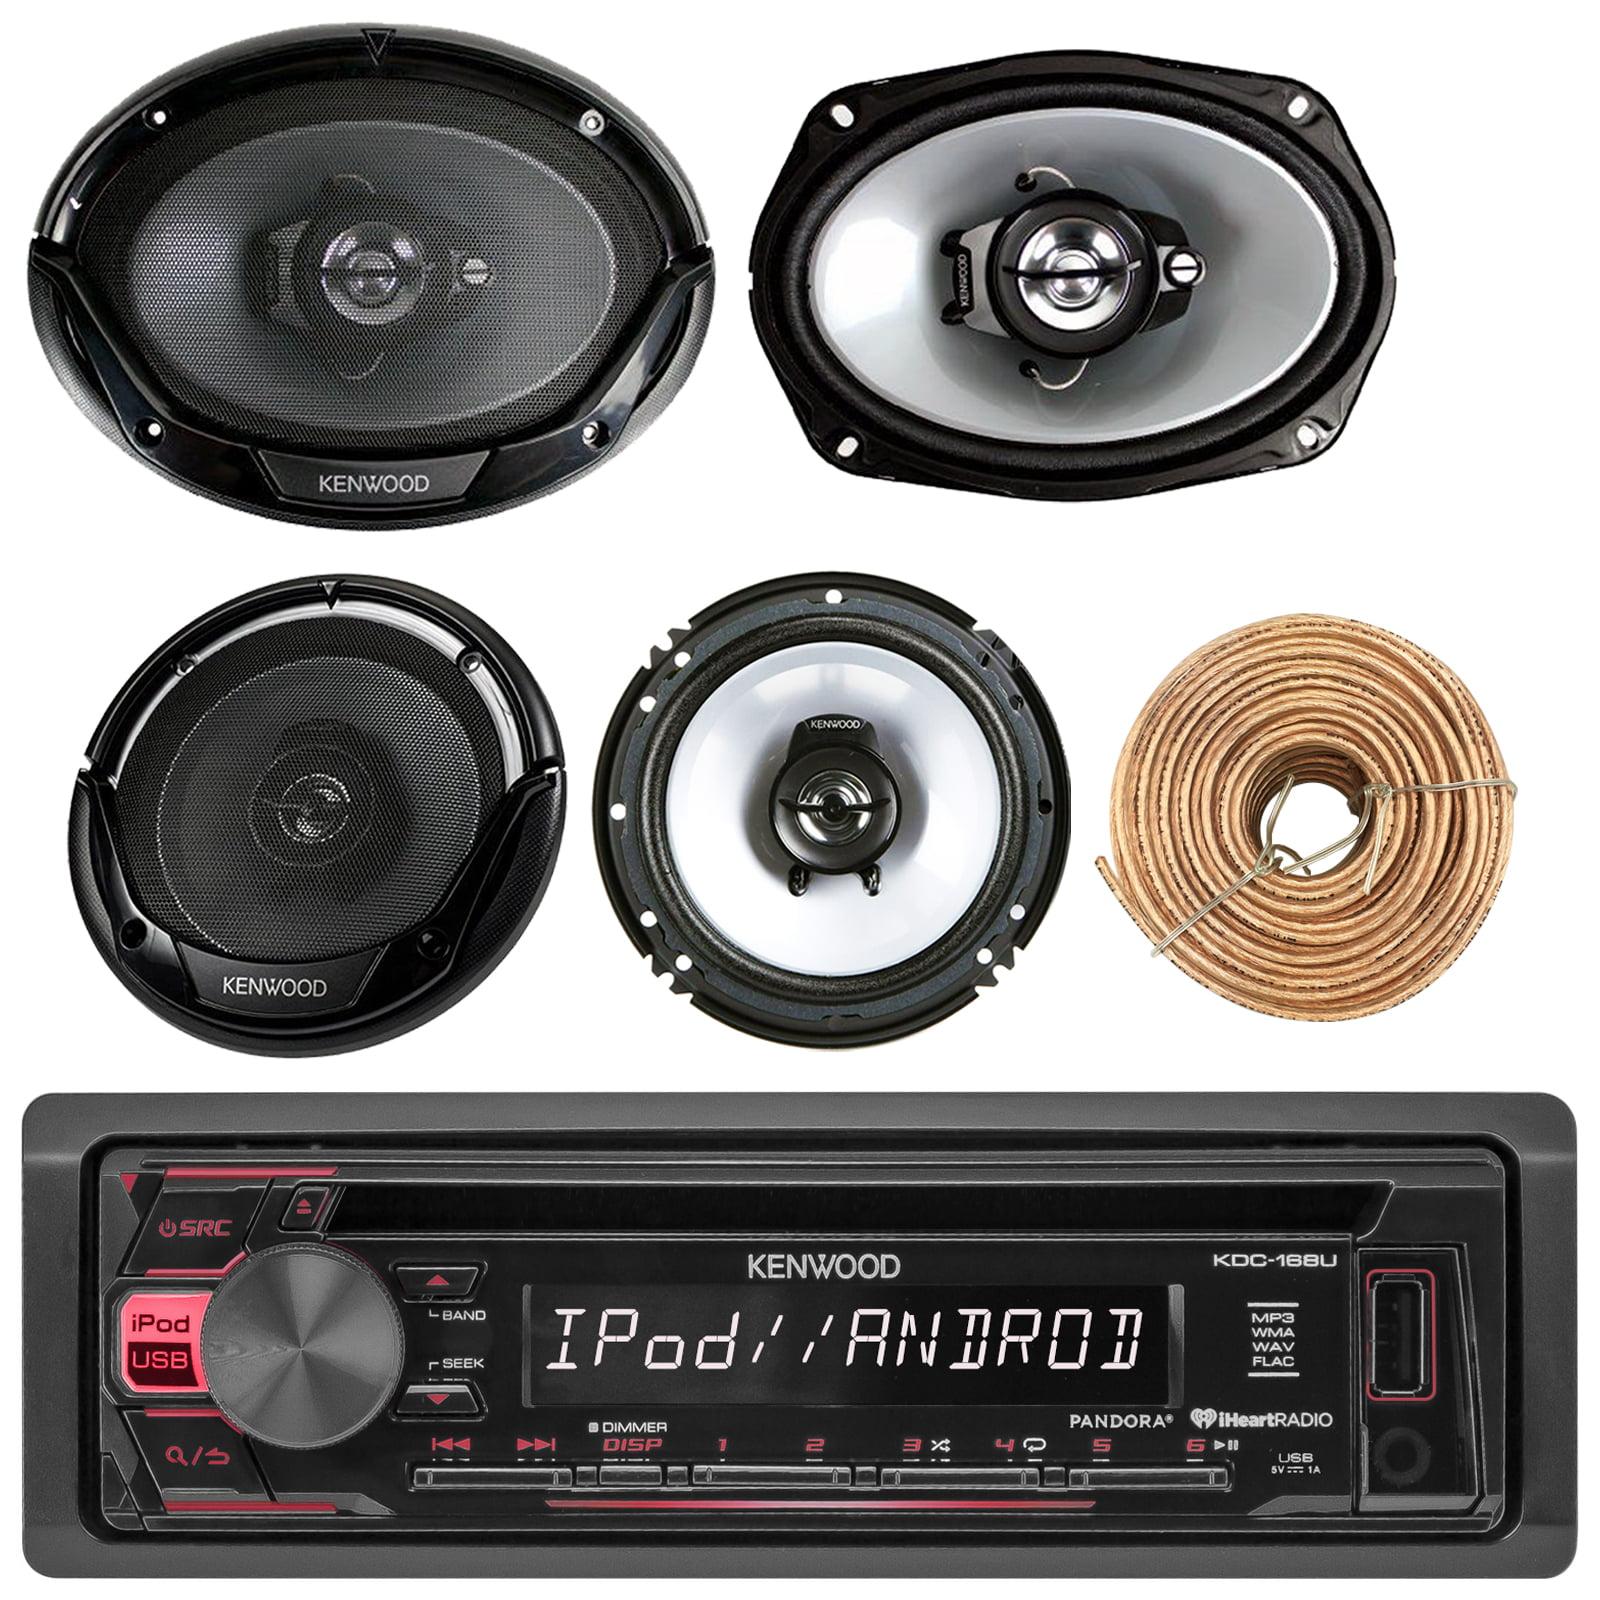 "Kenwood KDC168U Car CD Player Receiver USB AUX Radio - Bundle Combo With 2x Kenwood 6.5"" 2-Way Black Car Coaxial Speakers + 2x 6x9"" Inch 3-Way Speaker + Enrock 50 Foot 18g Wire"